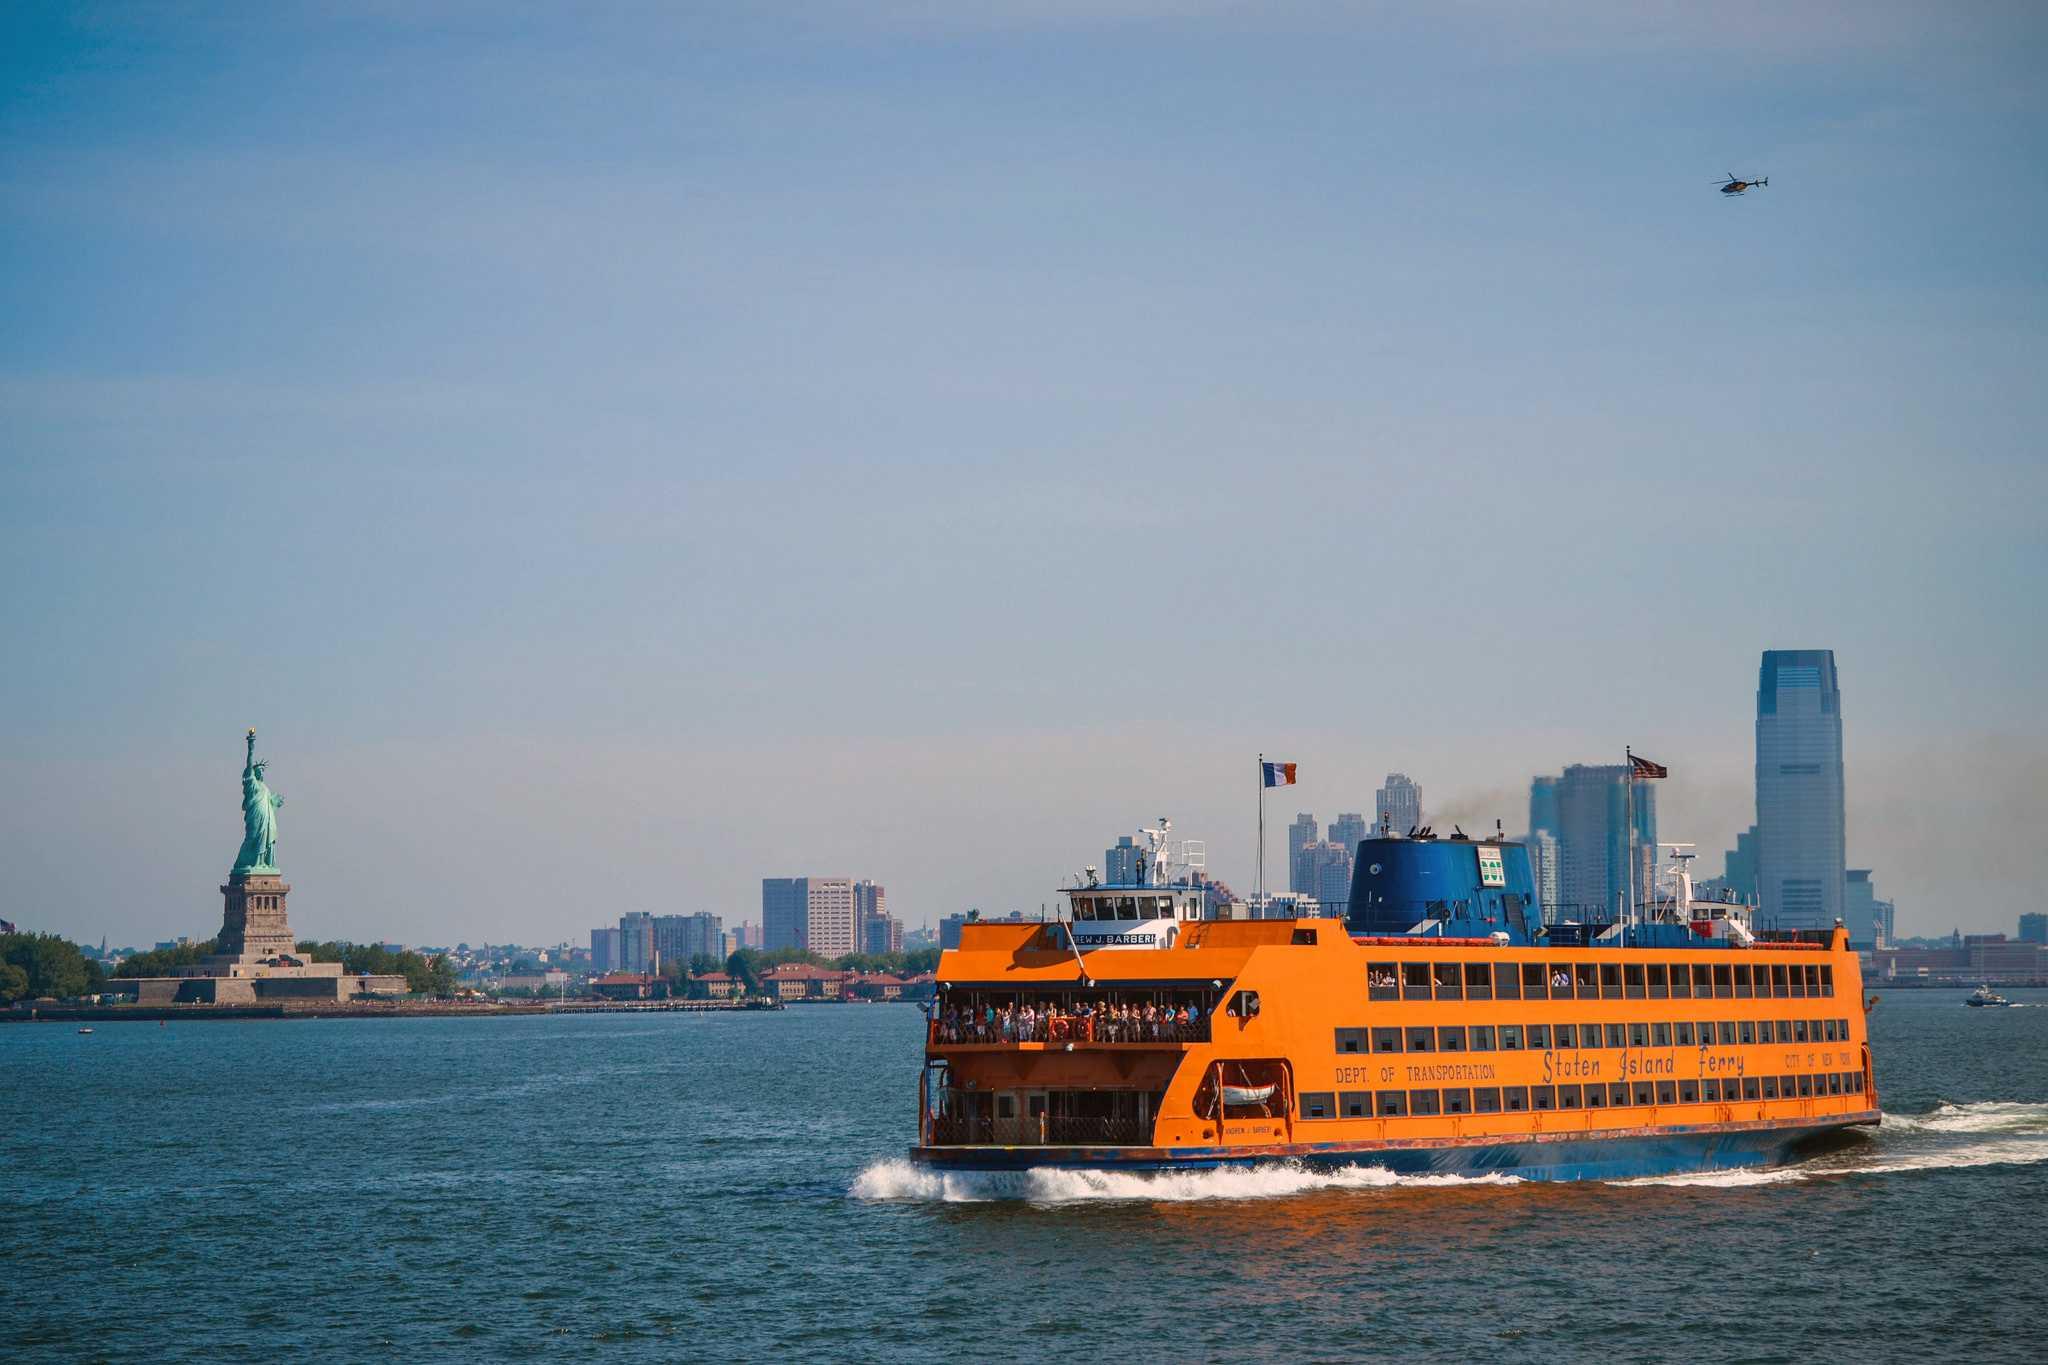 Statue of Liberty Staten Island ferry